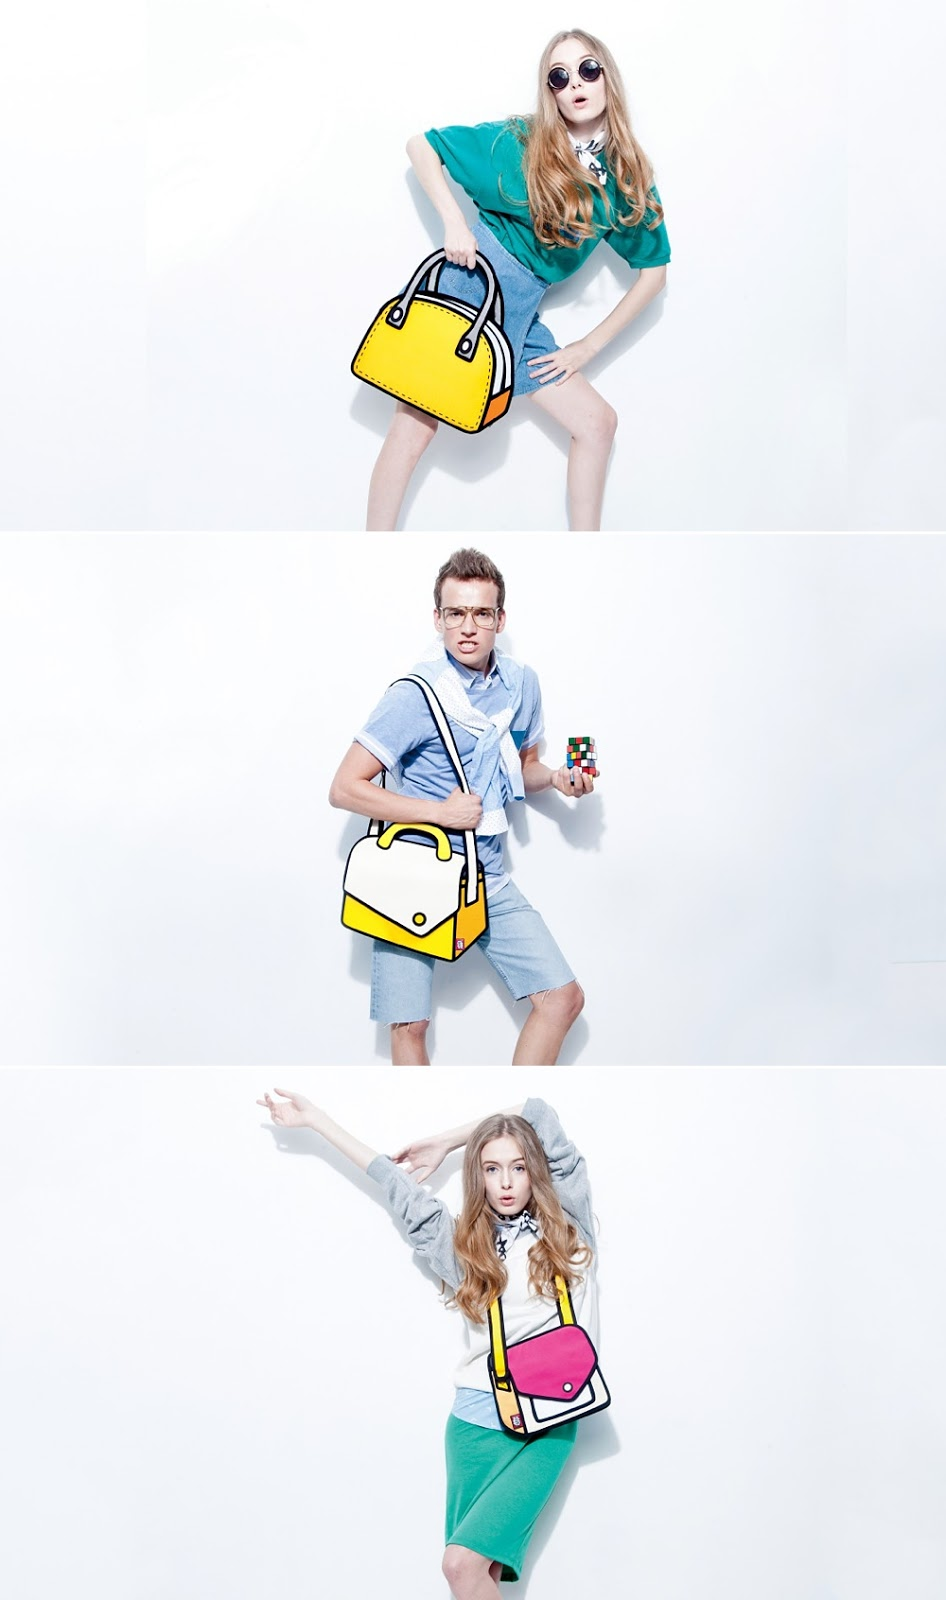 cartoon-bag-jump-from-paper.jpg